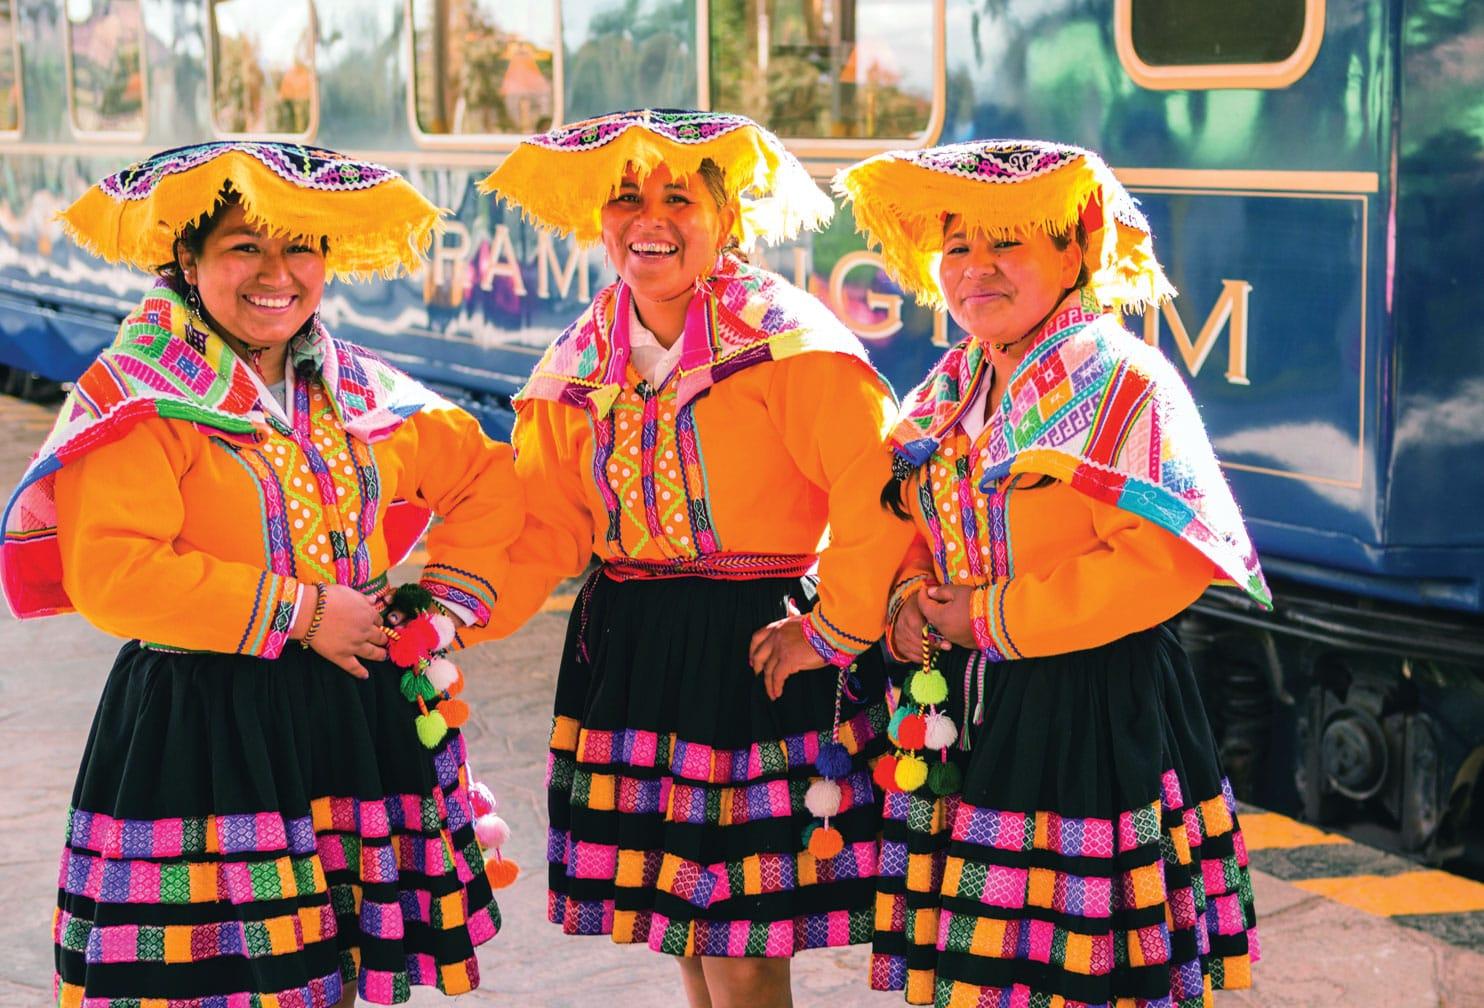 Three women in traditional costume on the Belmond Hiram Bingham train